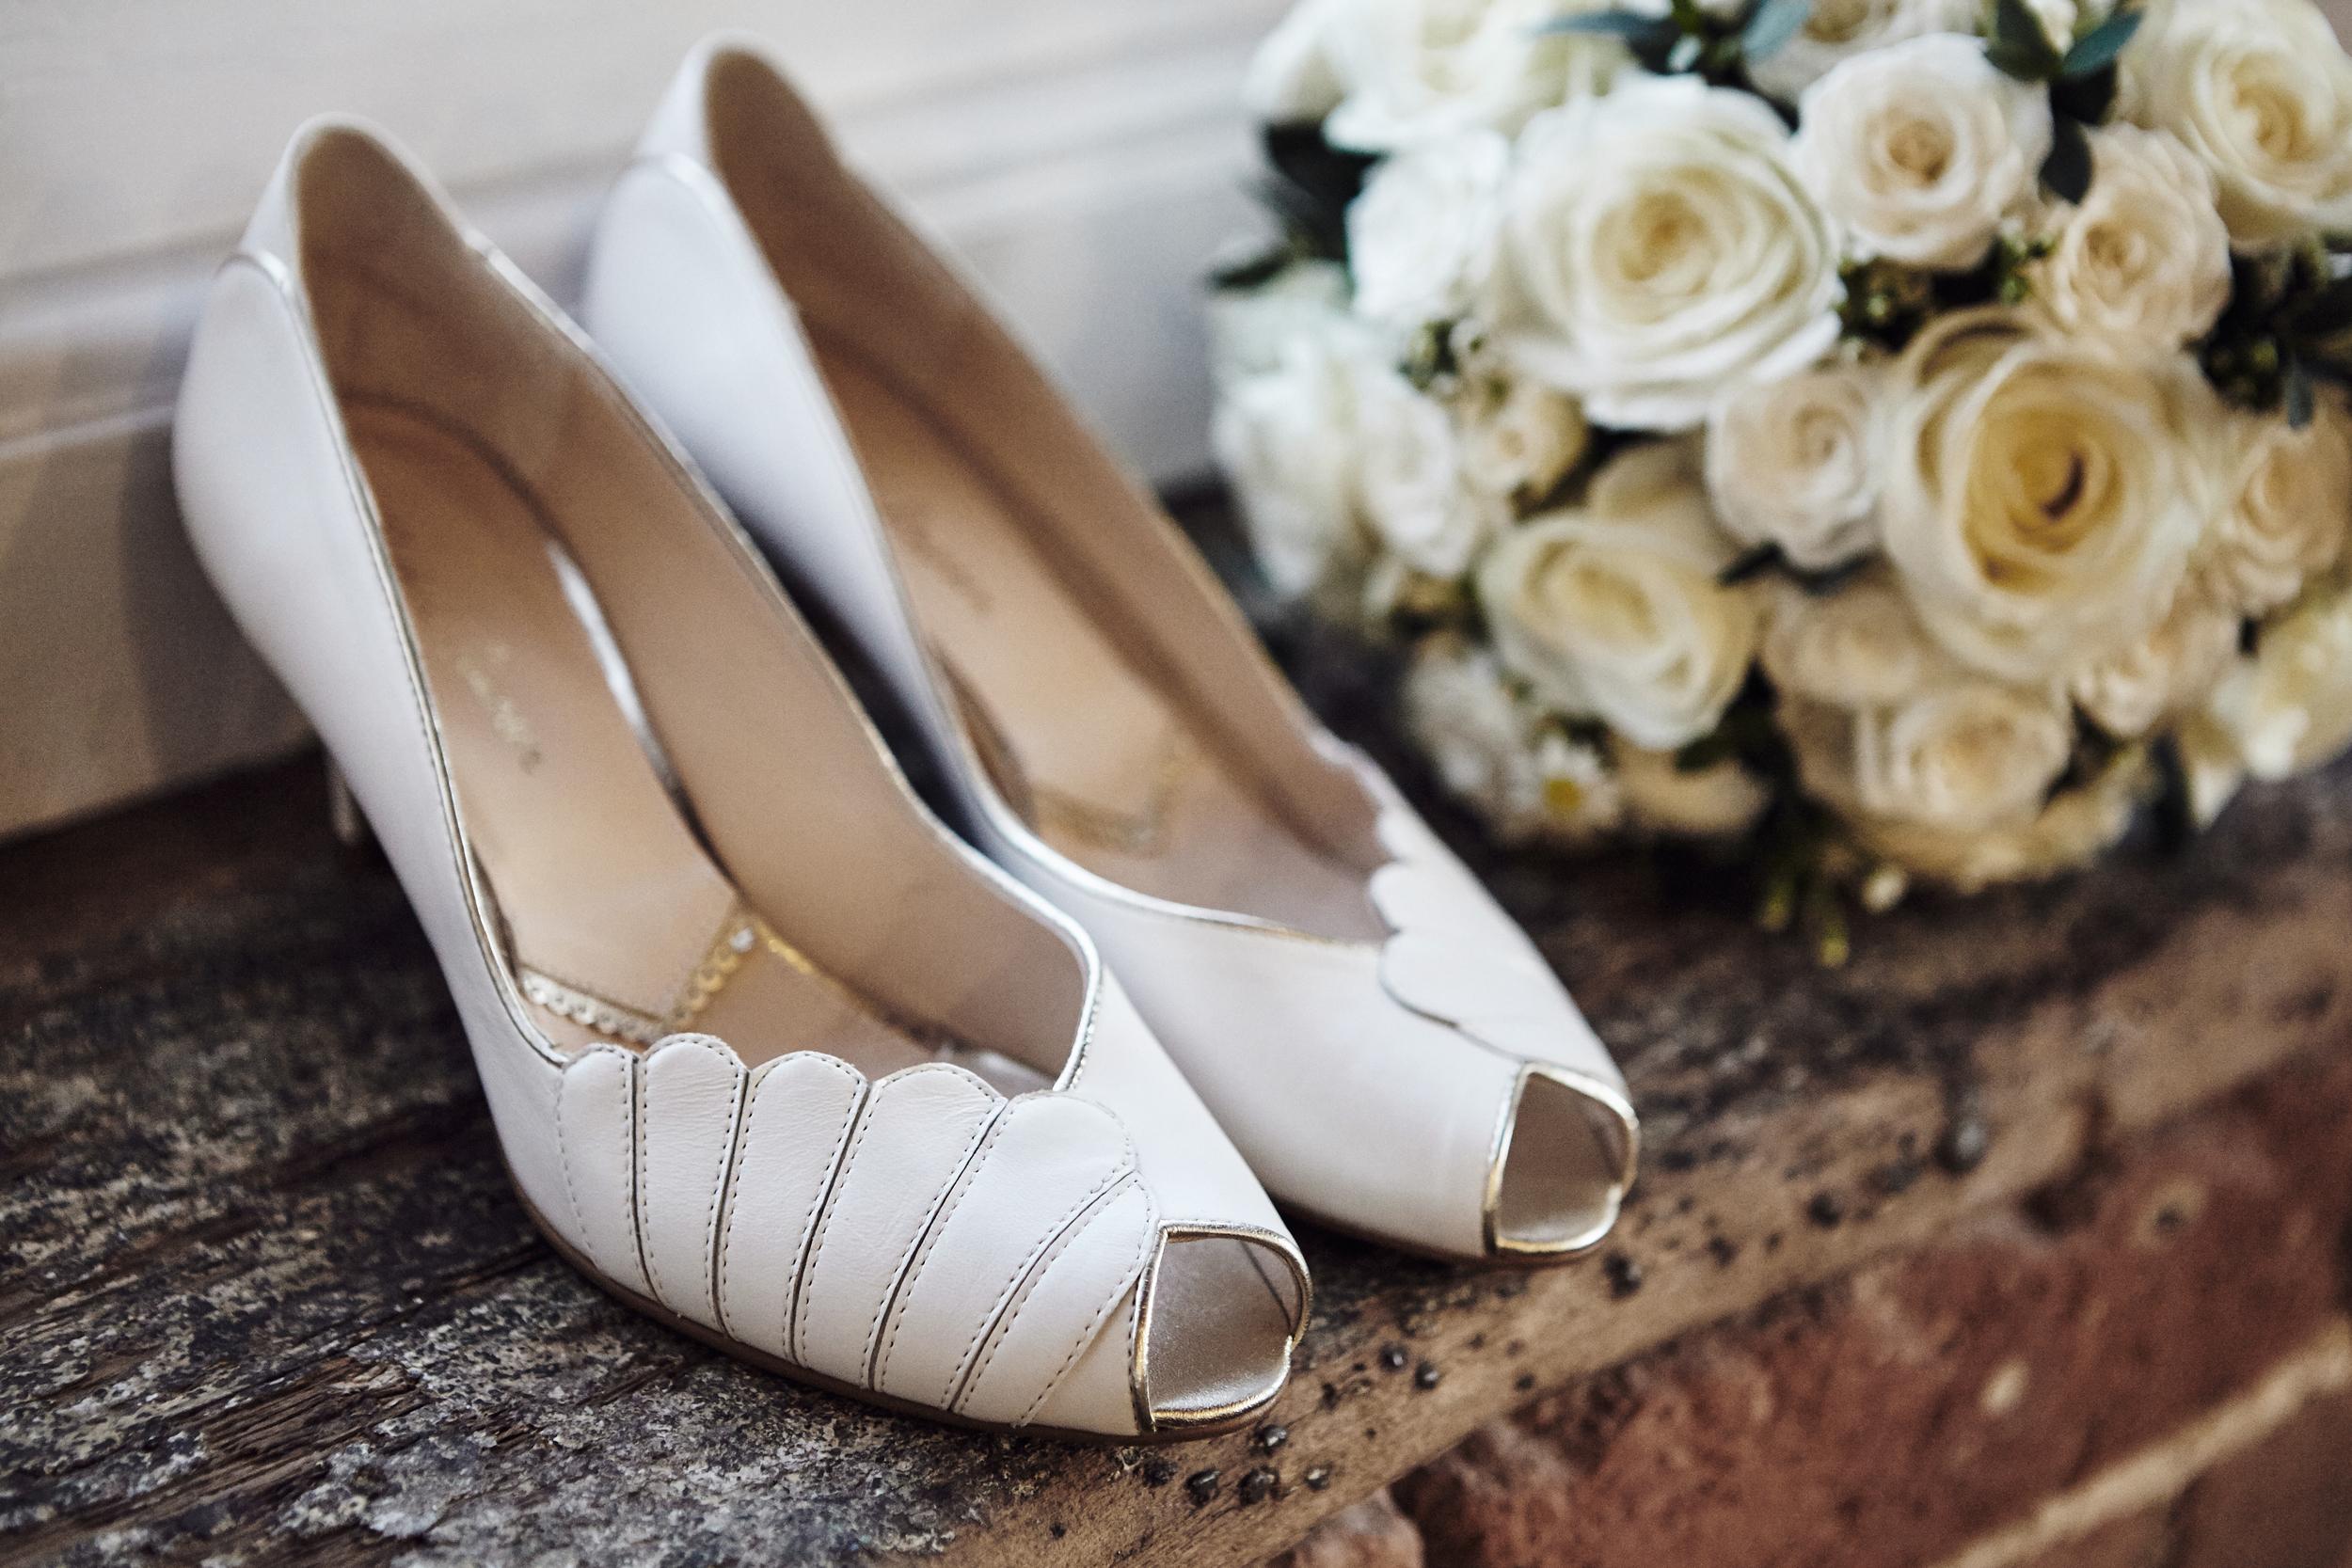 rachel simpson ada shoes